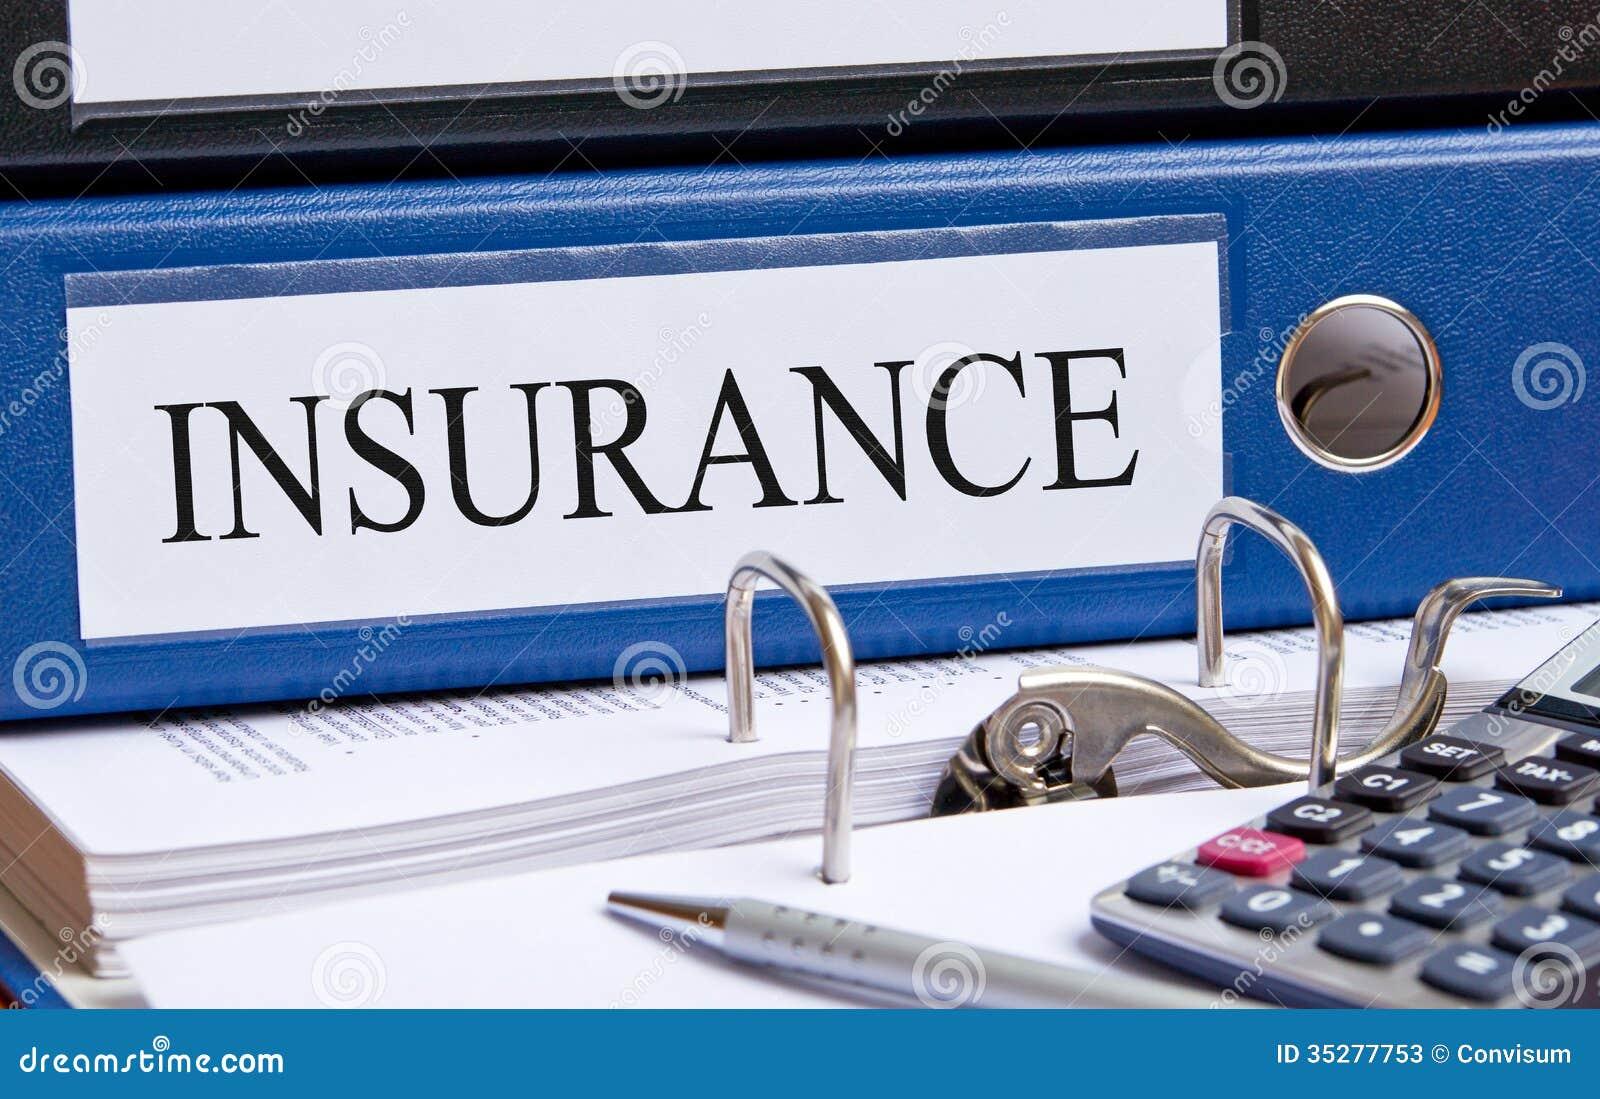 insurance binder on office desk